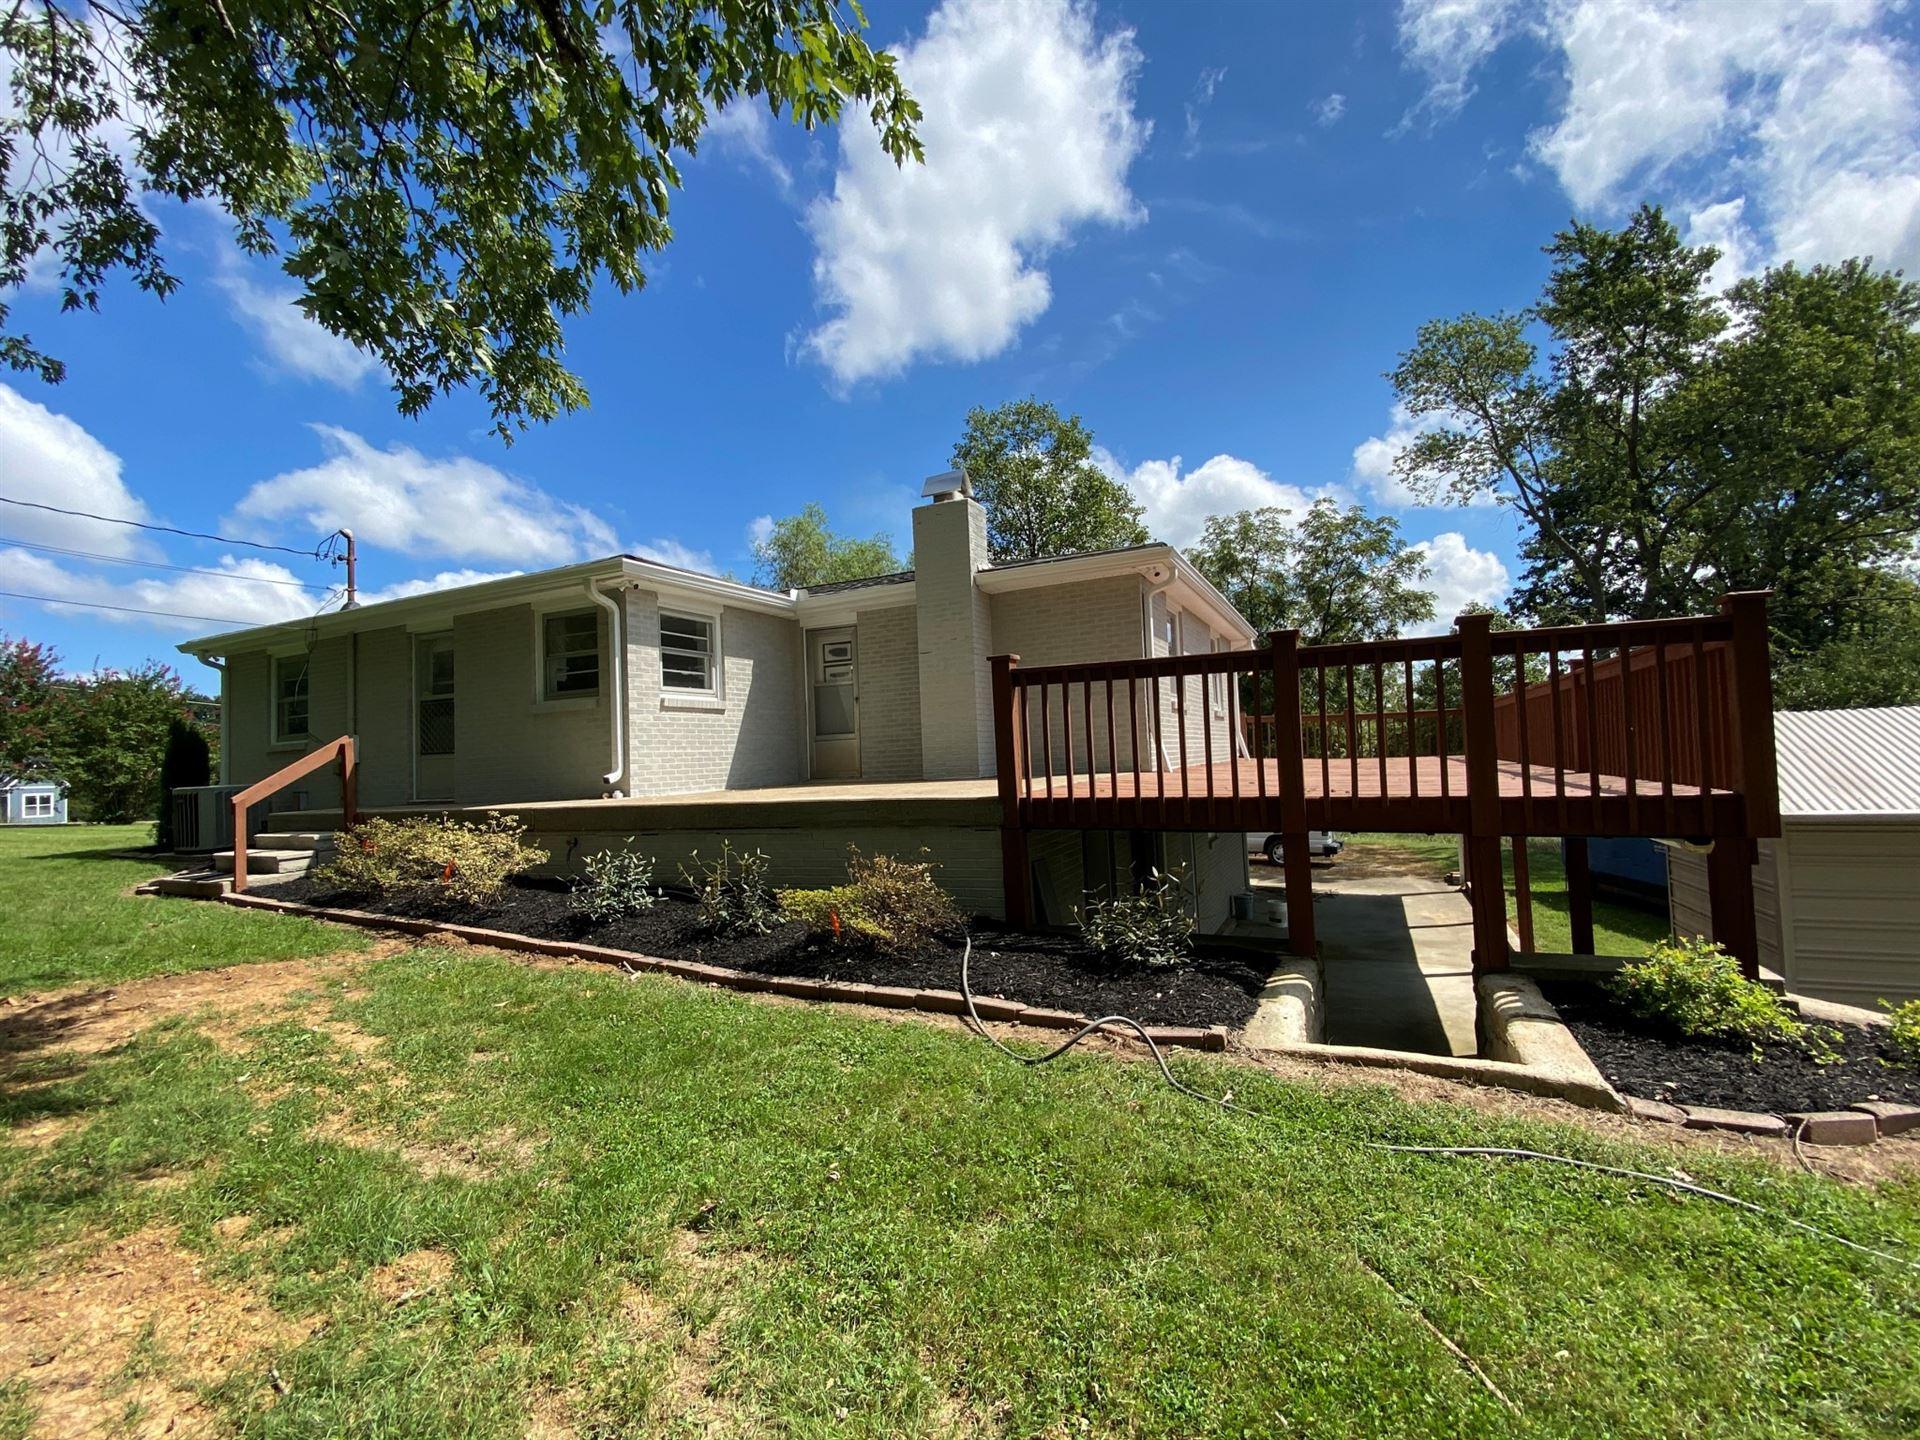 Photo of 441 Northern Rd, Mount Juliet, TN 37122 (MLS # 2291897)